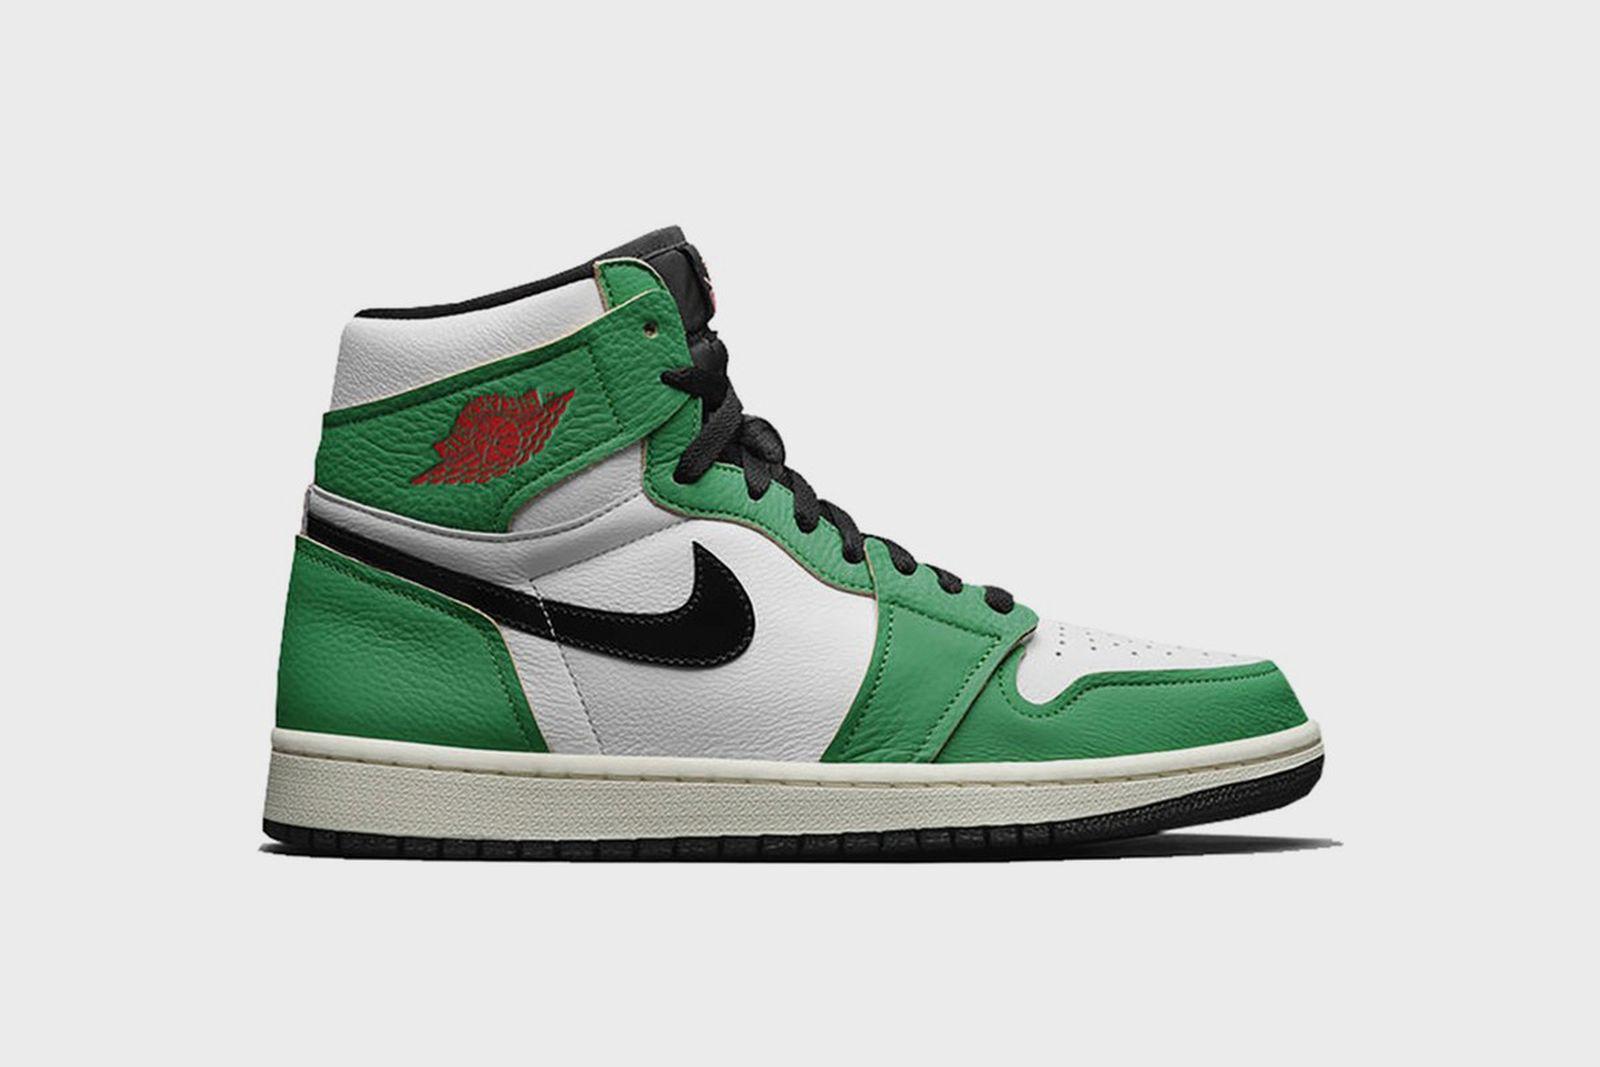 Buy the Air Jordan 1